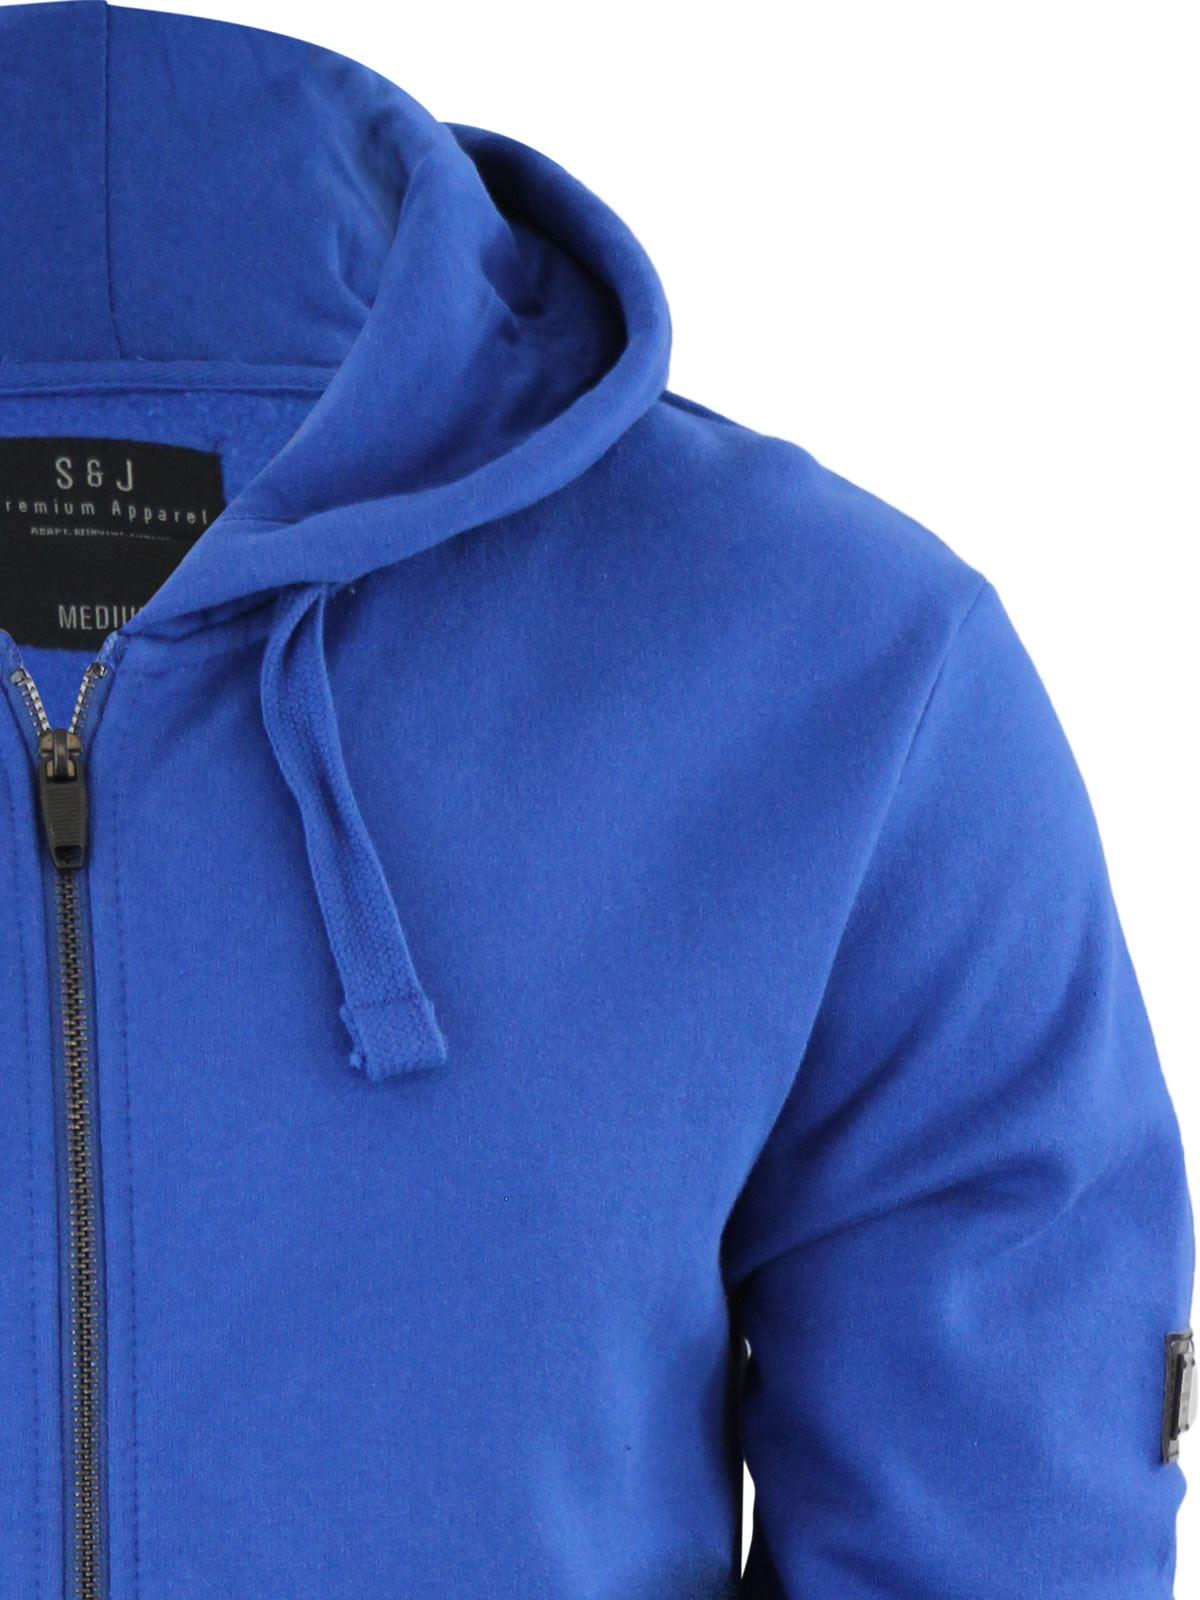 Mens-Hoodie-Smith-amp-Jones-Zip-Up-Hooded-Sweater-Jumper thumbnail 16